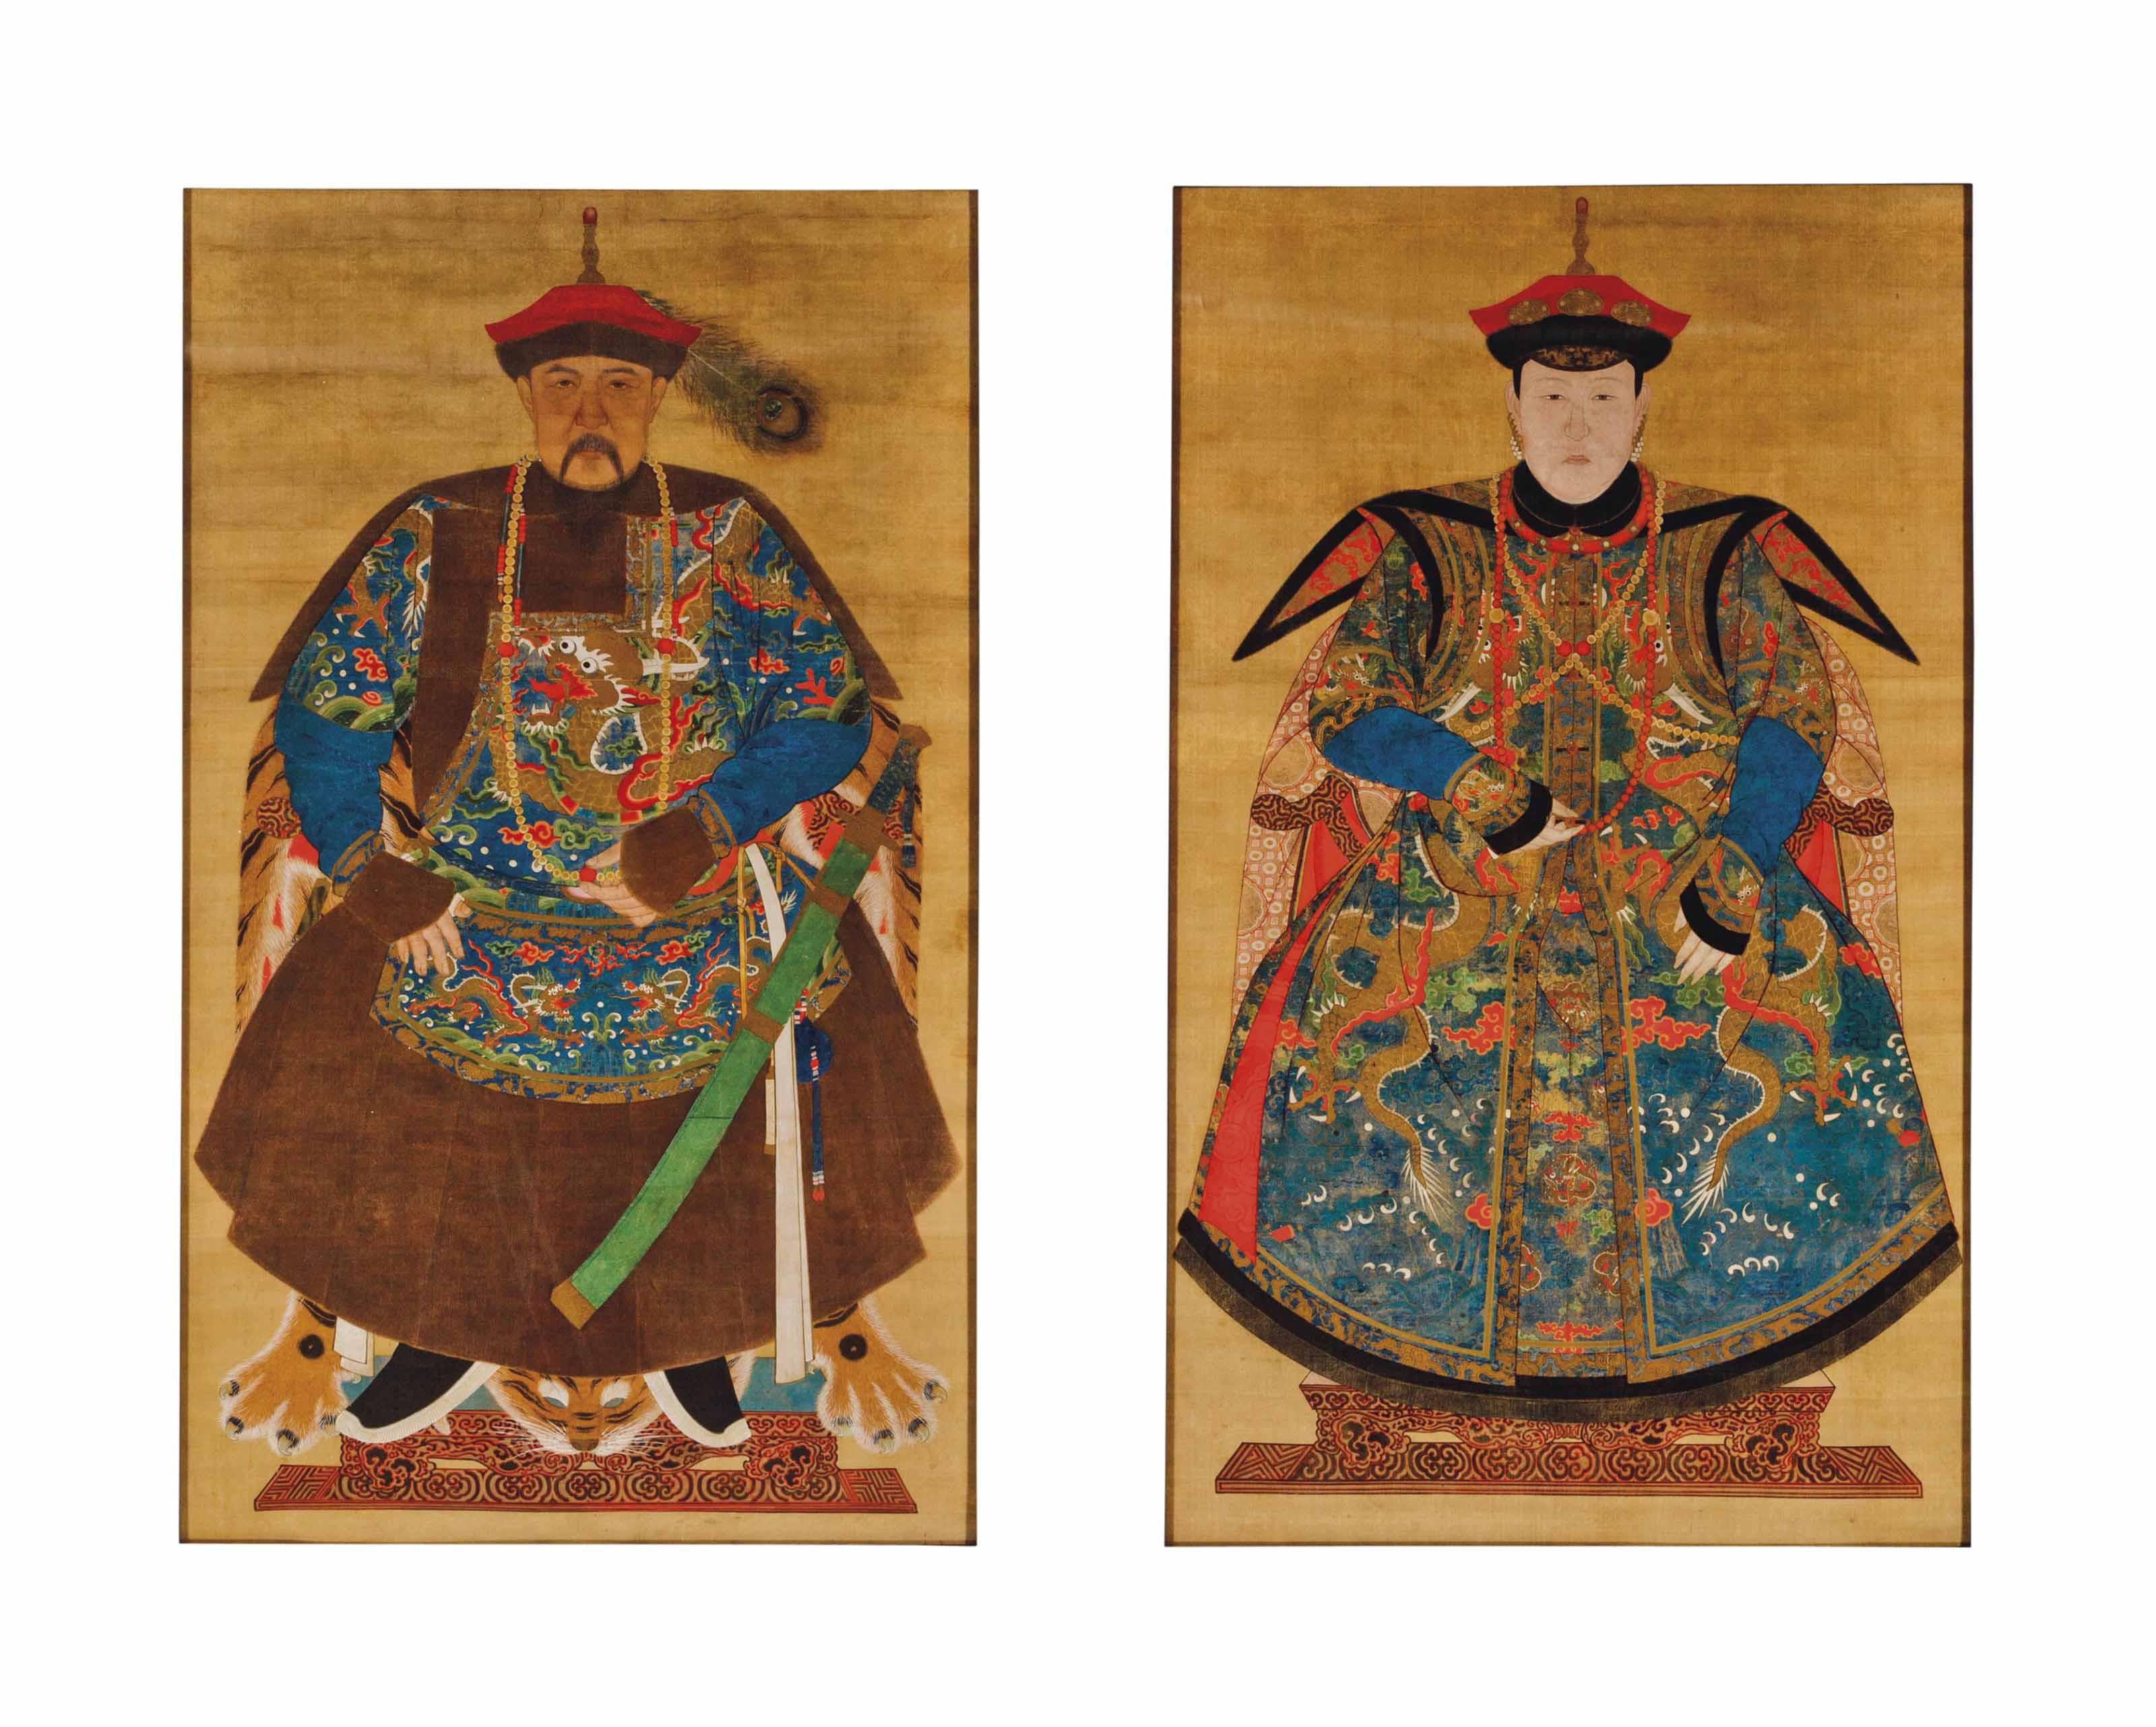 A PAIR OF CHINESE ANCEST0R POR